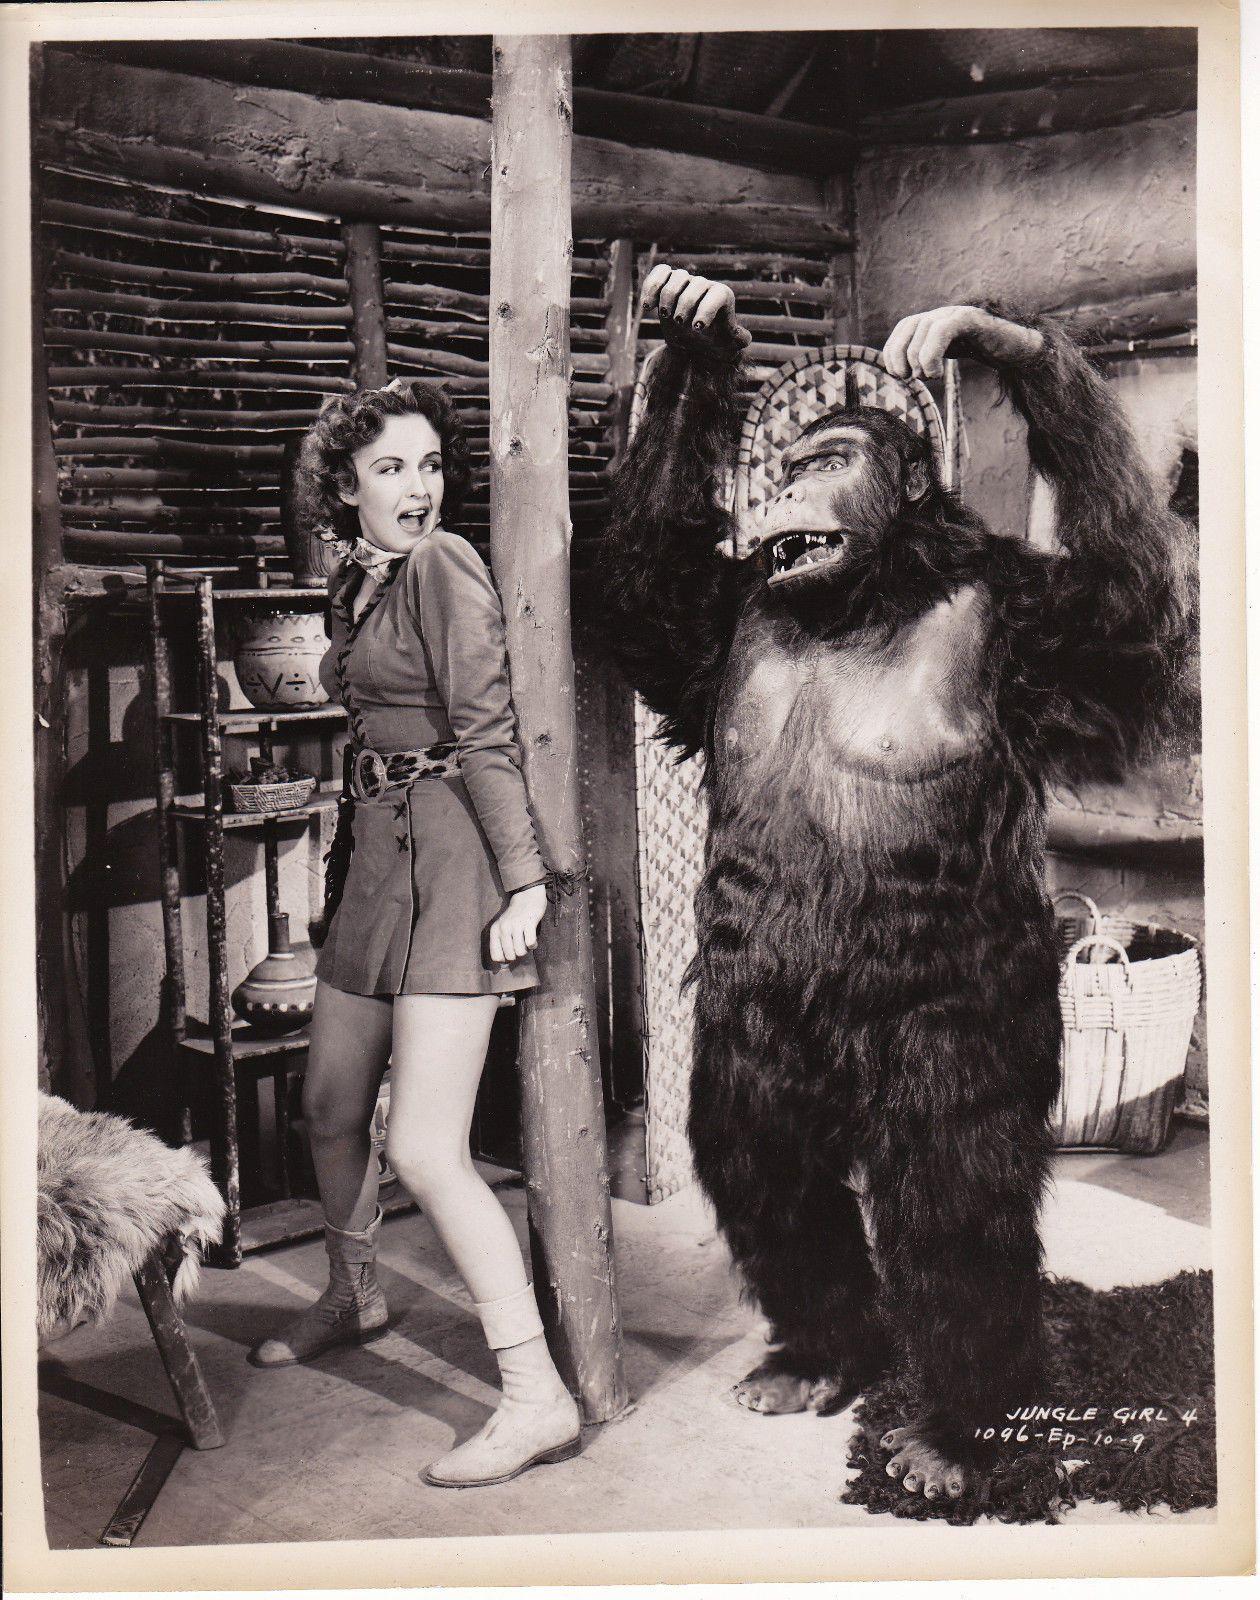 Jungle Girl (serial) Jungle Girl 15 Chapter Republic Serial 1941 starring Frances